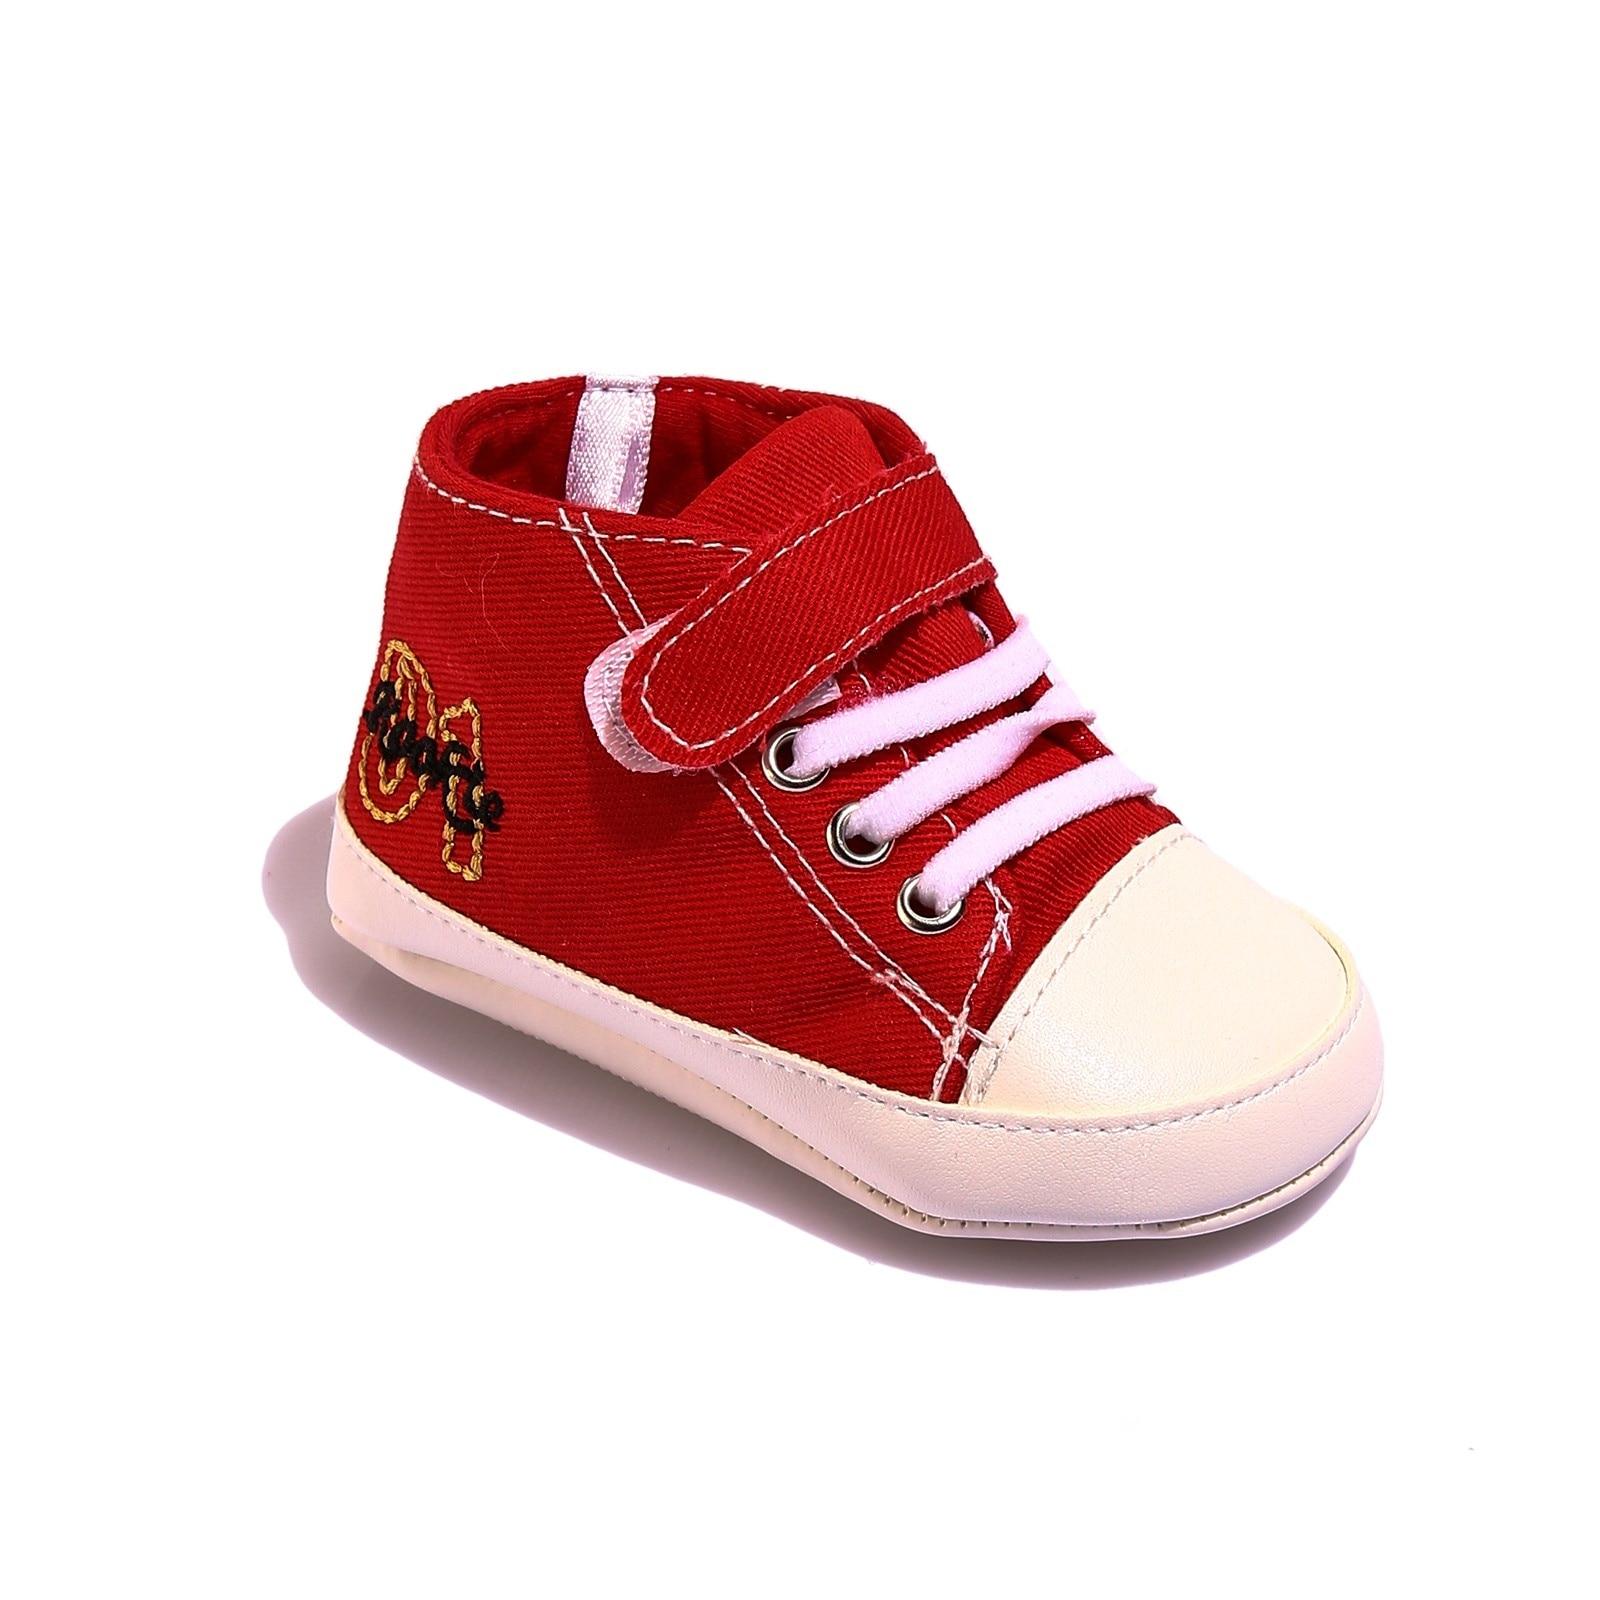 Ebebek First Step Summer Baby Boy Shoes